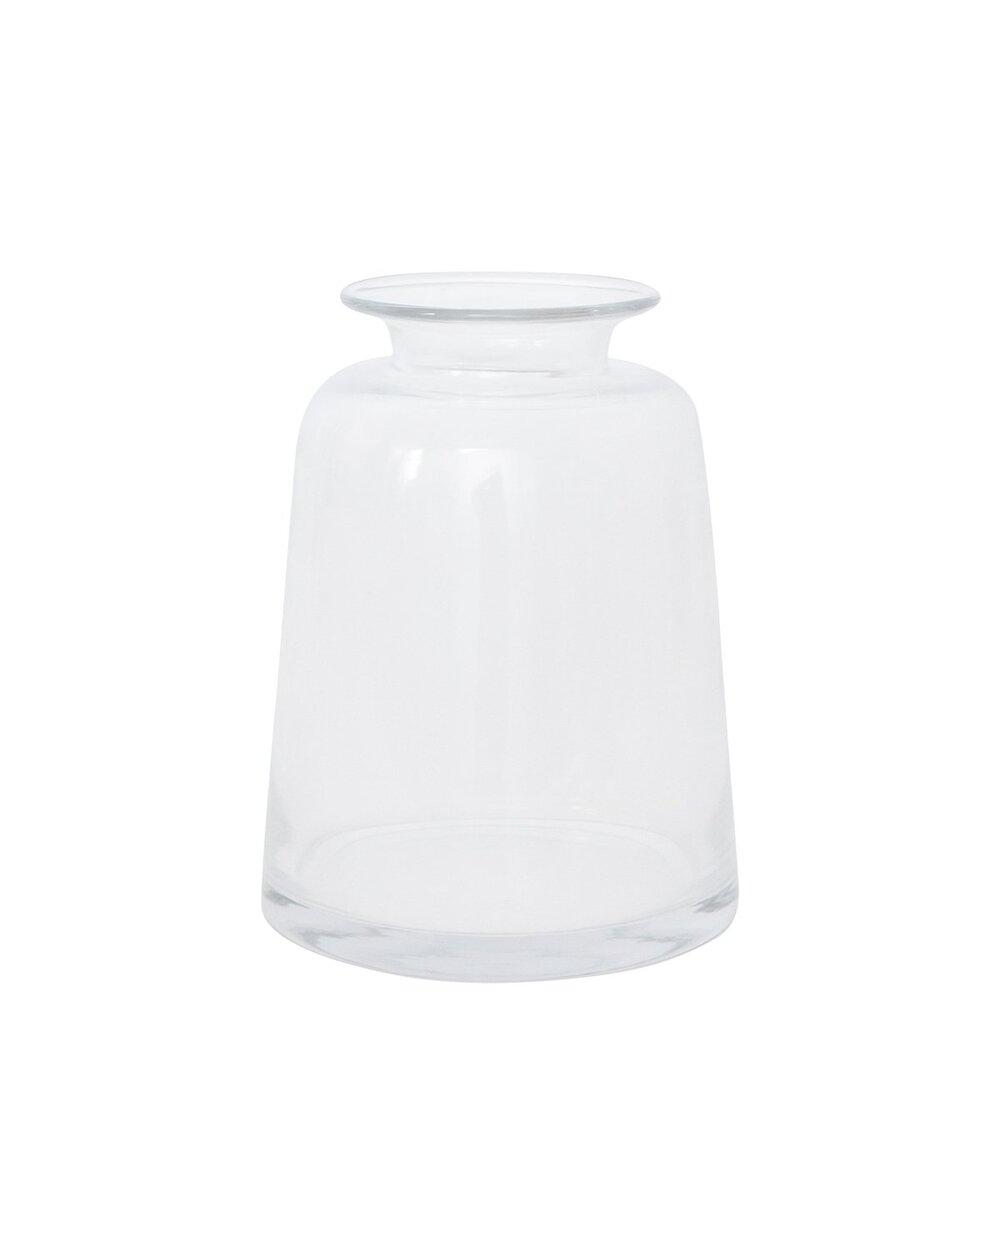 Glass_Flower_Vase01_3c9f7f7e-5d71-4ee2-a13f-02a5aa662ed5.jpg